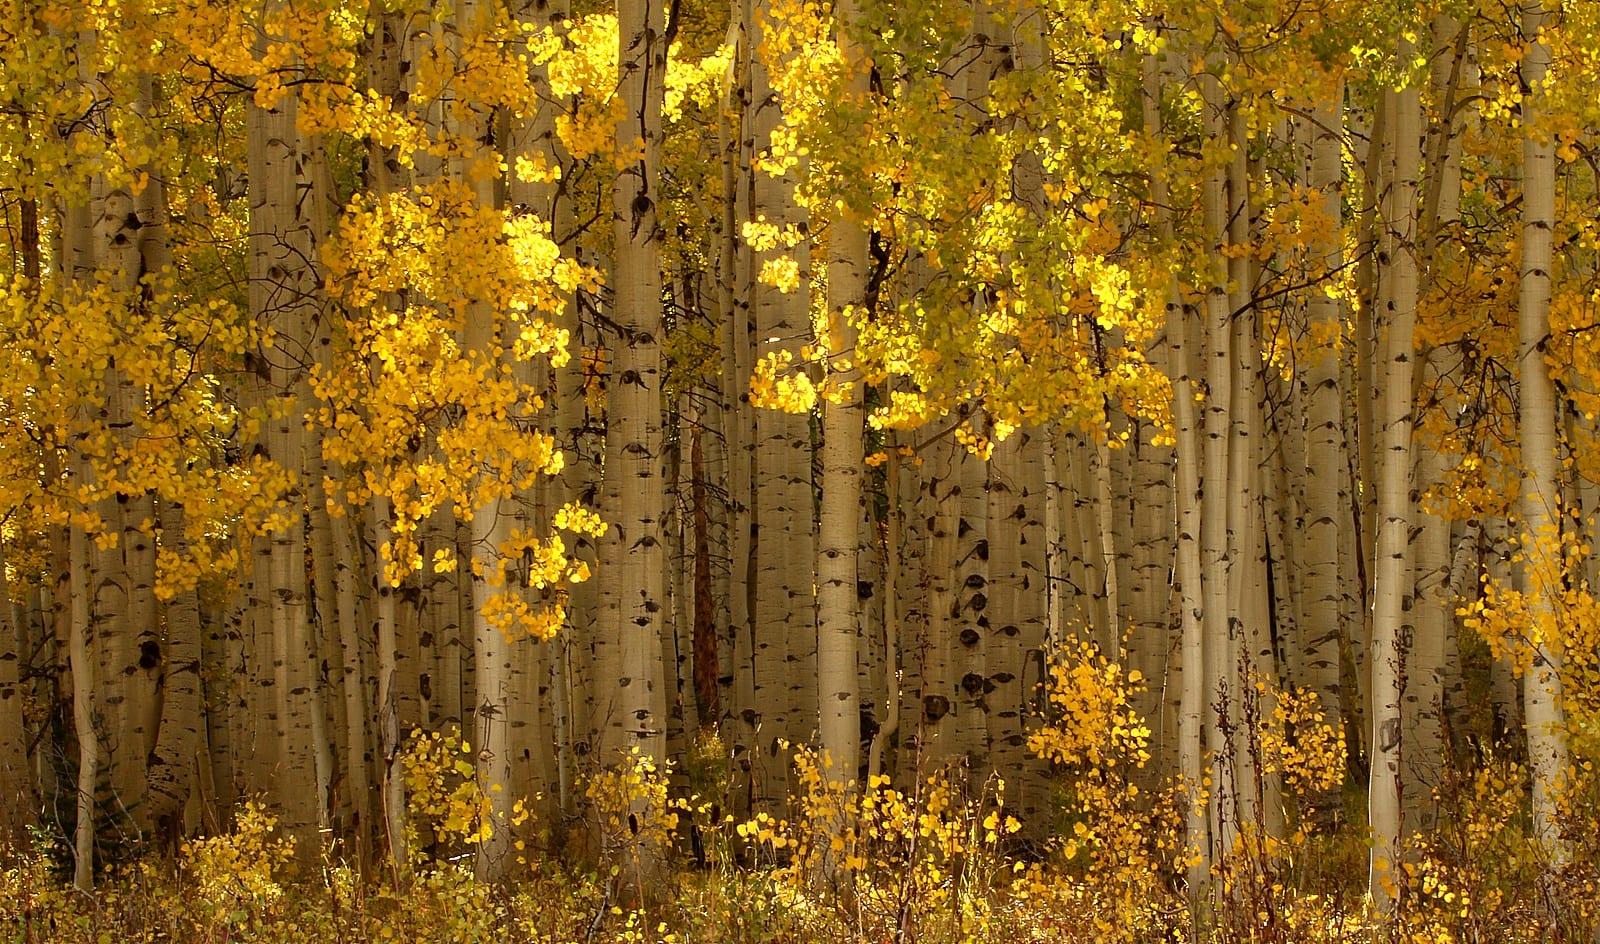 Native Colorado Plants Aspen Grove on Kebler Pass Fall Gold Colors